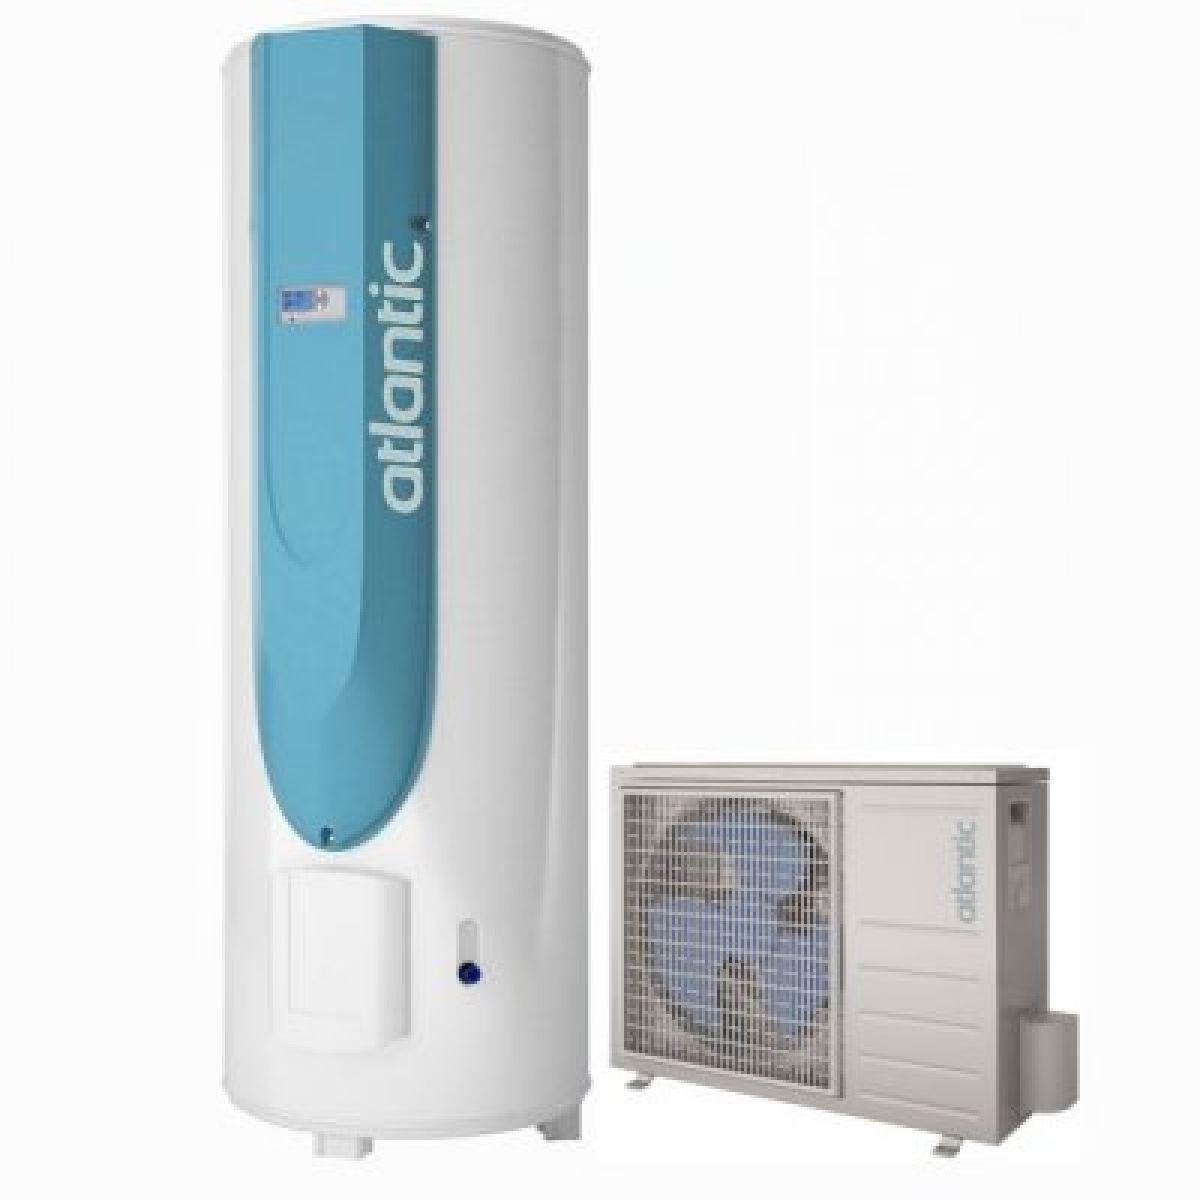 Installation de chauffe eau thermodynamique marseille bbc energies - Installation chauffe eau thermodynamique ...